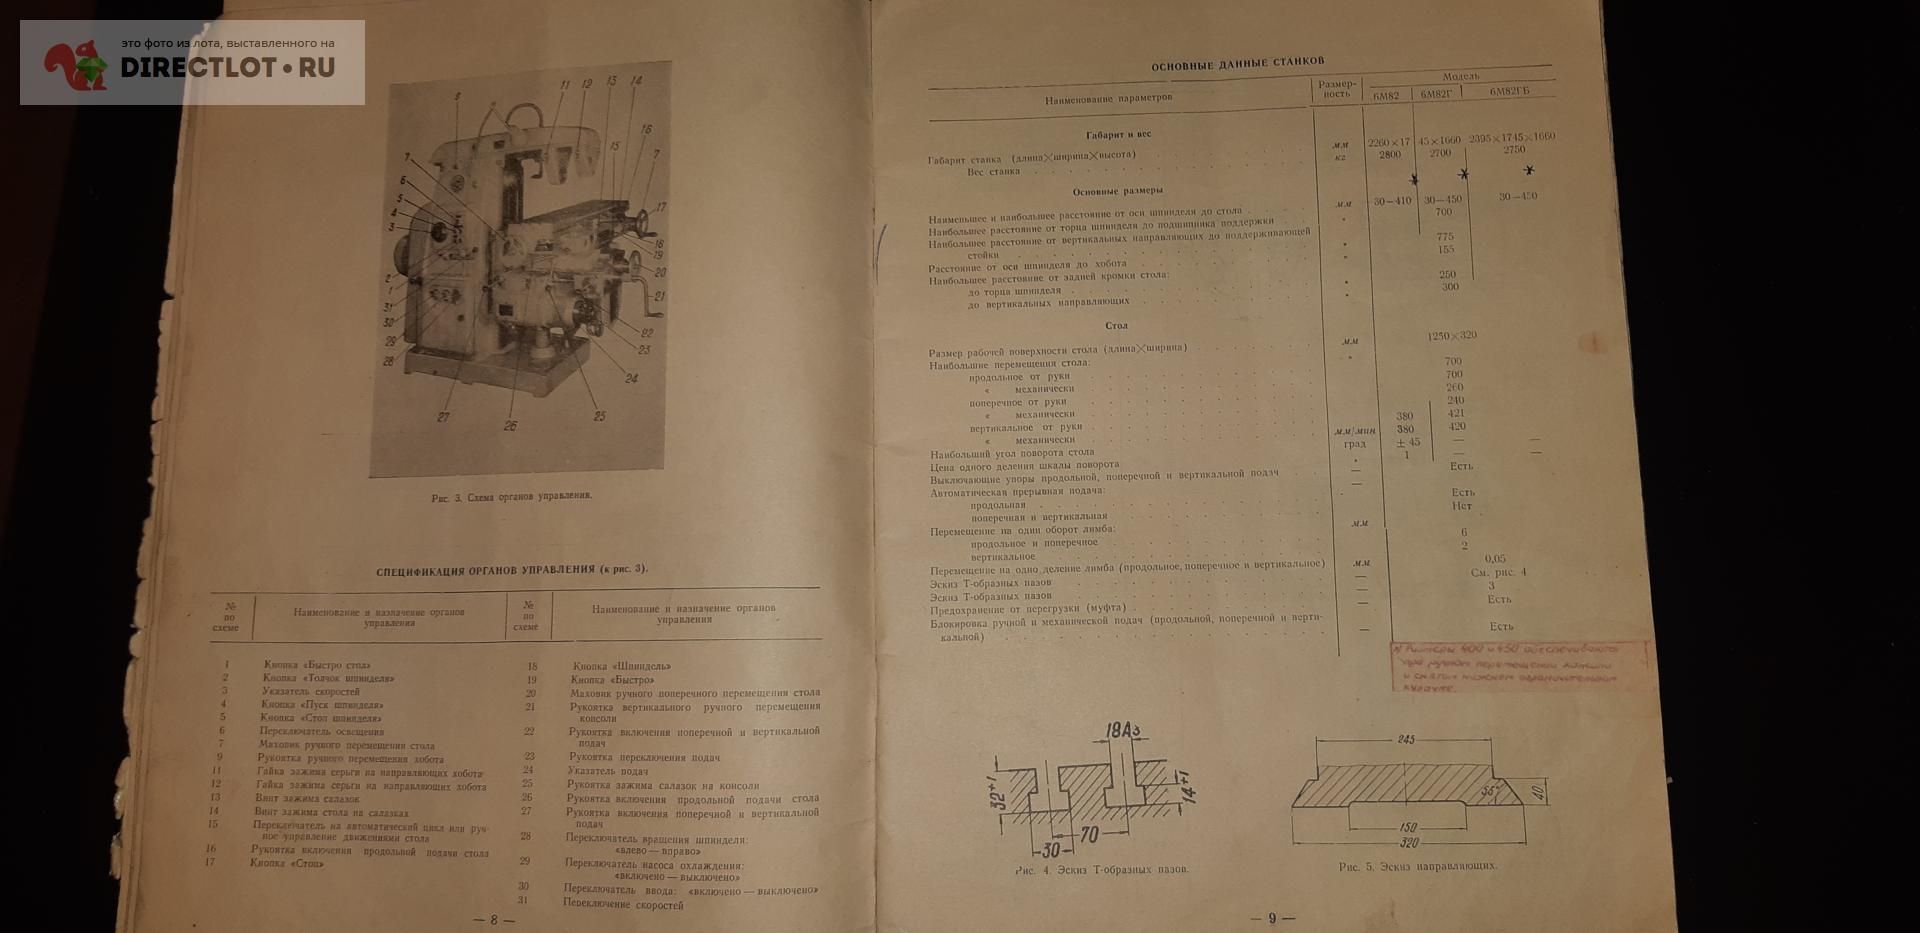 6м13п – все технические параметры фрезерного агрегата + видео